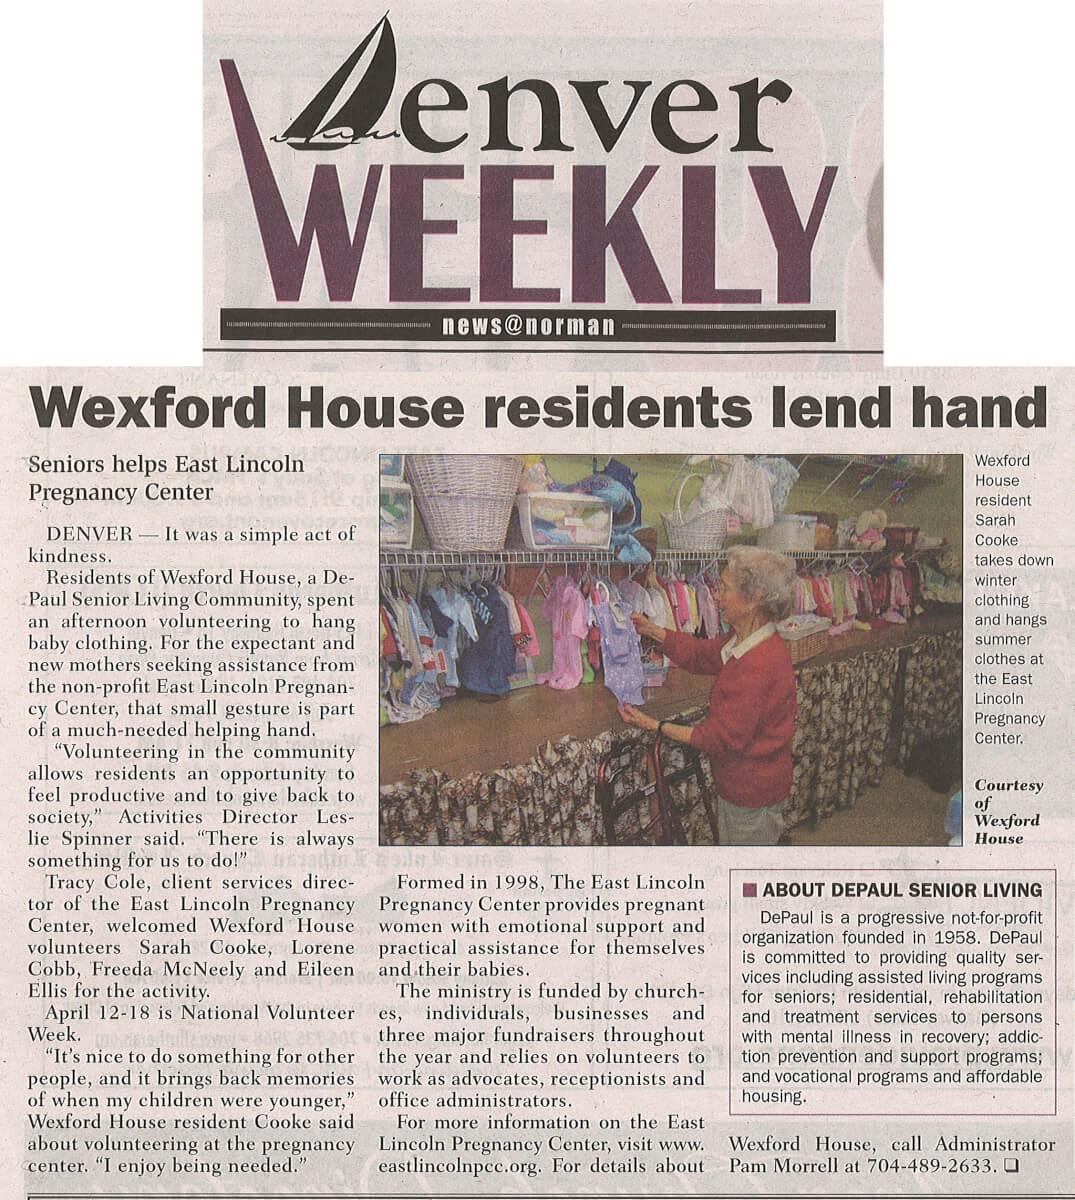 Wexford House Volunteers, article in the April 10-16 Denver Weekly